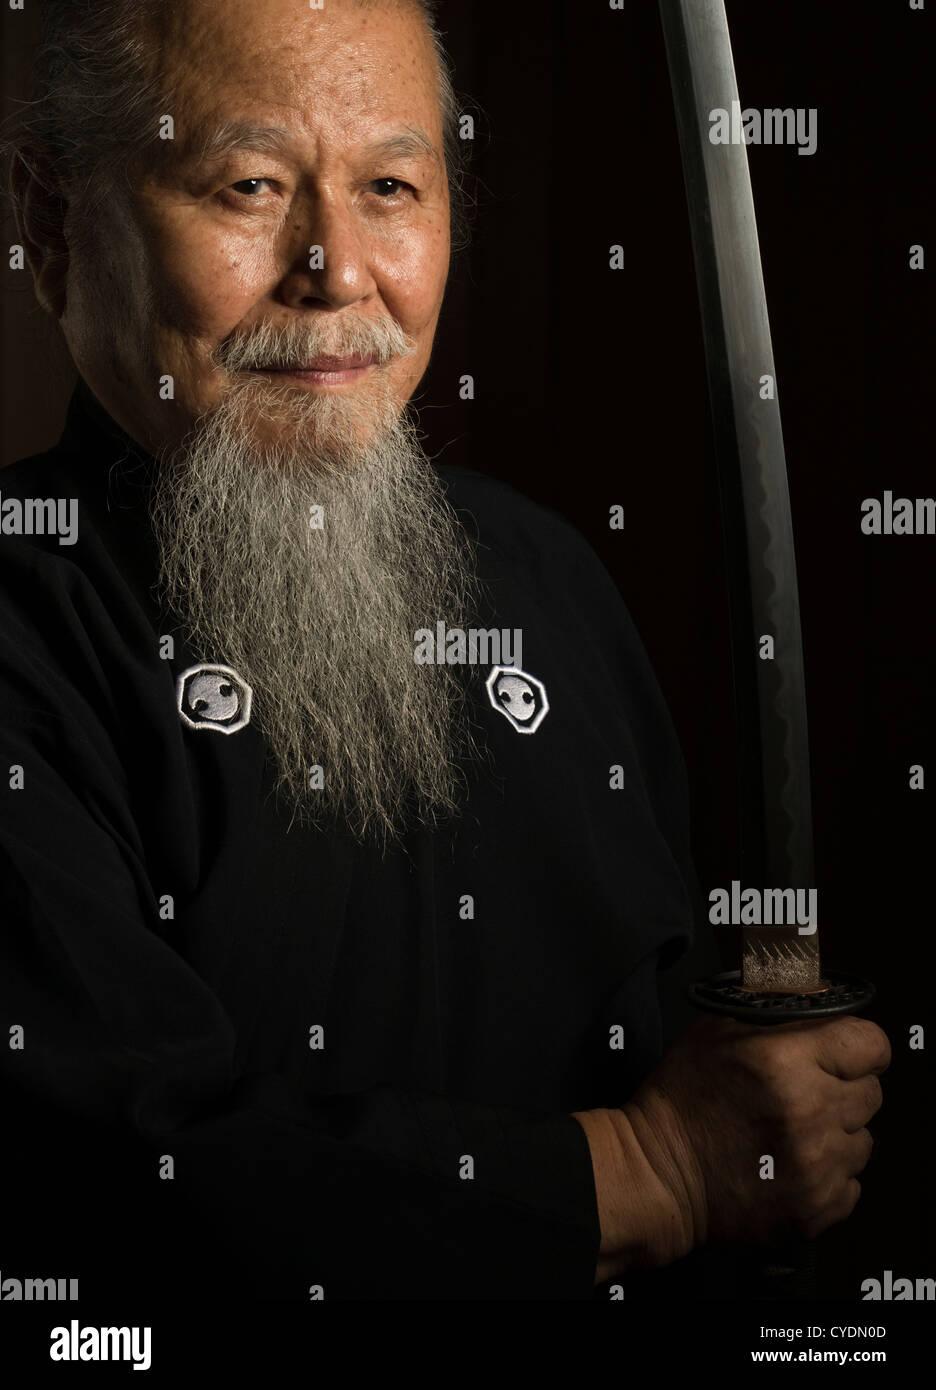 Hamamoto Sensei Maître Iaido japonais à Okinawa, Japon Photo Stock